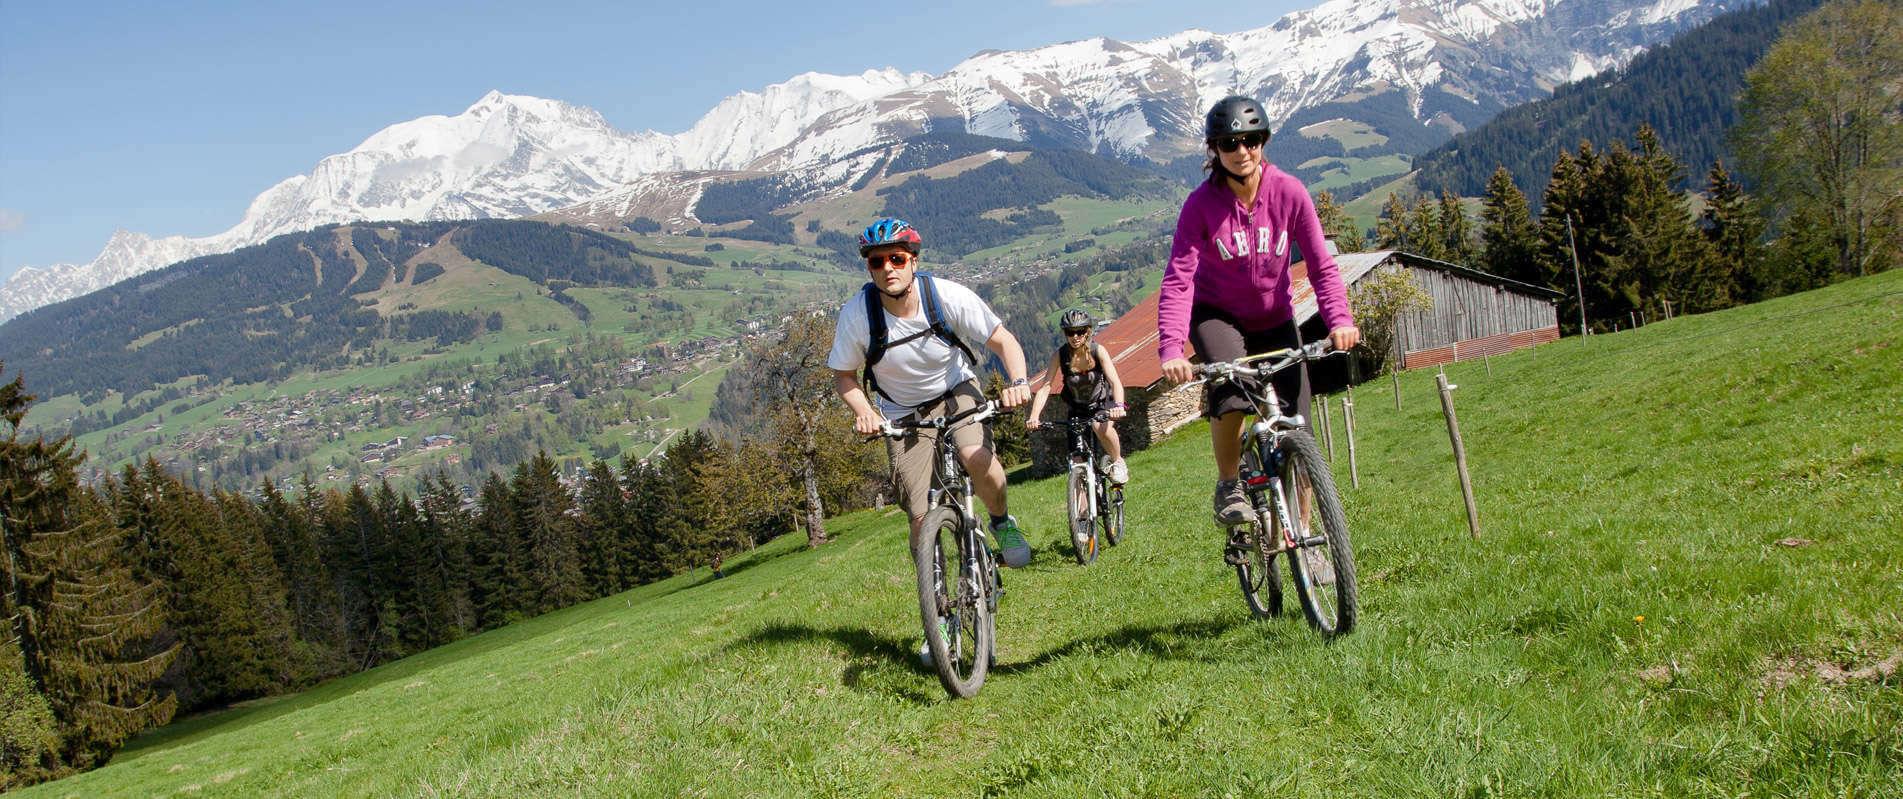 Mountain-biking-horizontal-edited.jpg